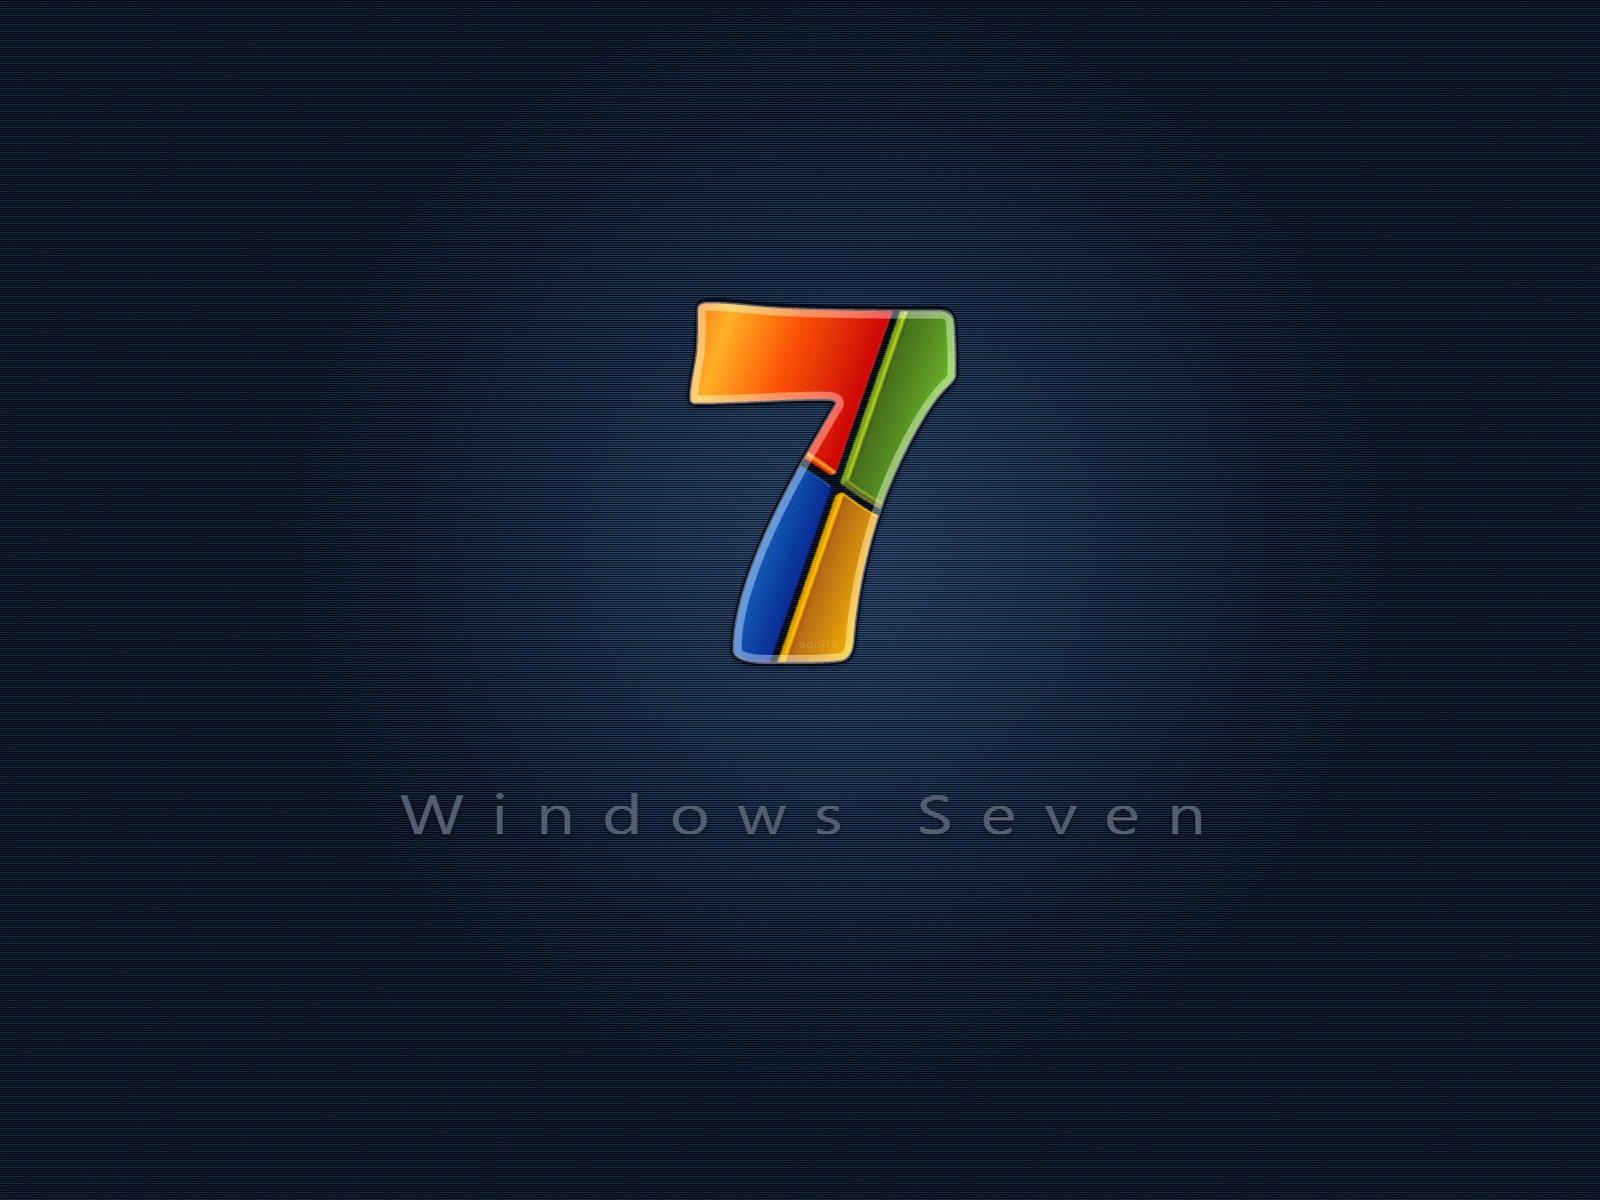 تحميل ويندوز 7 مجانا